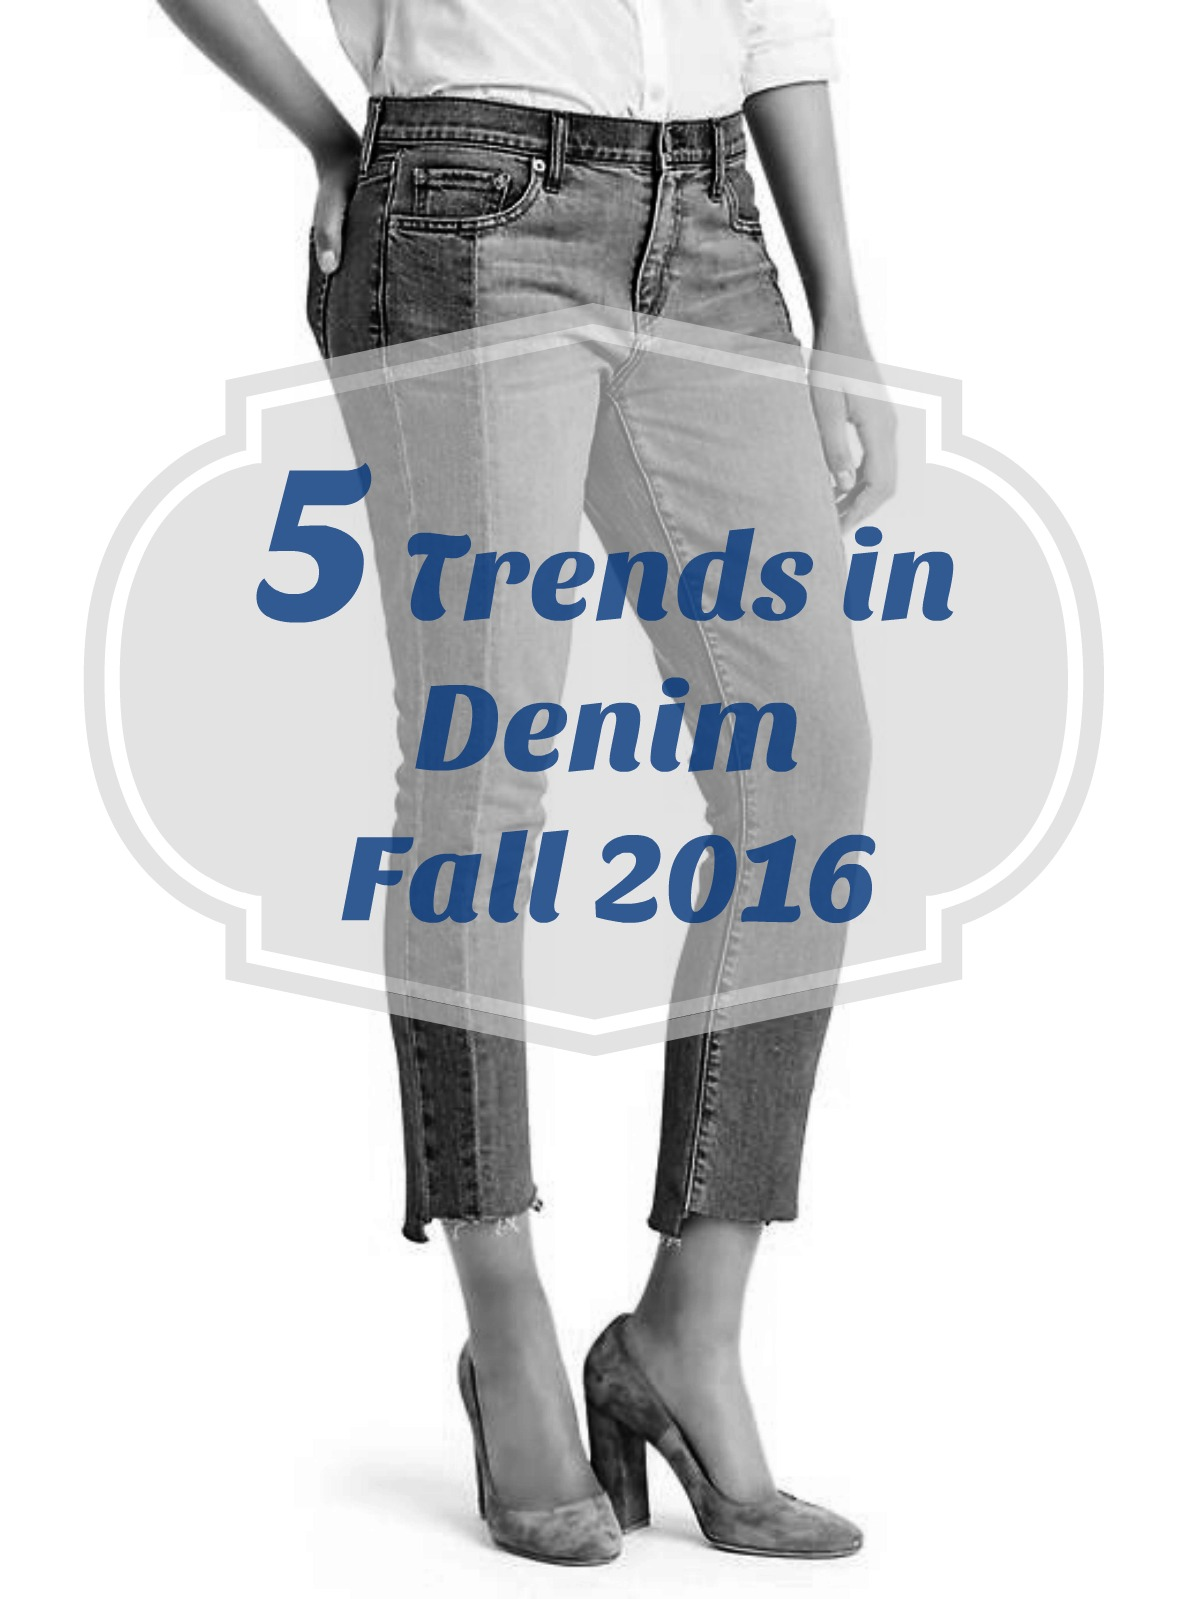 5 Denim Trends: Fall 2016